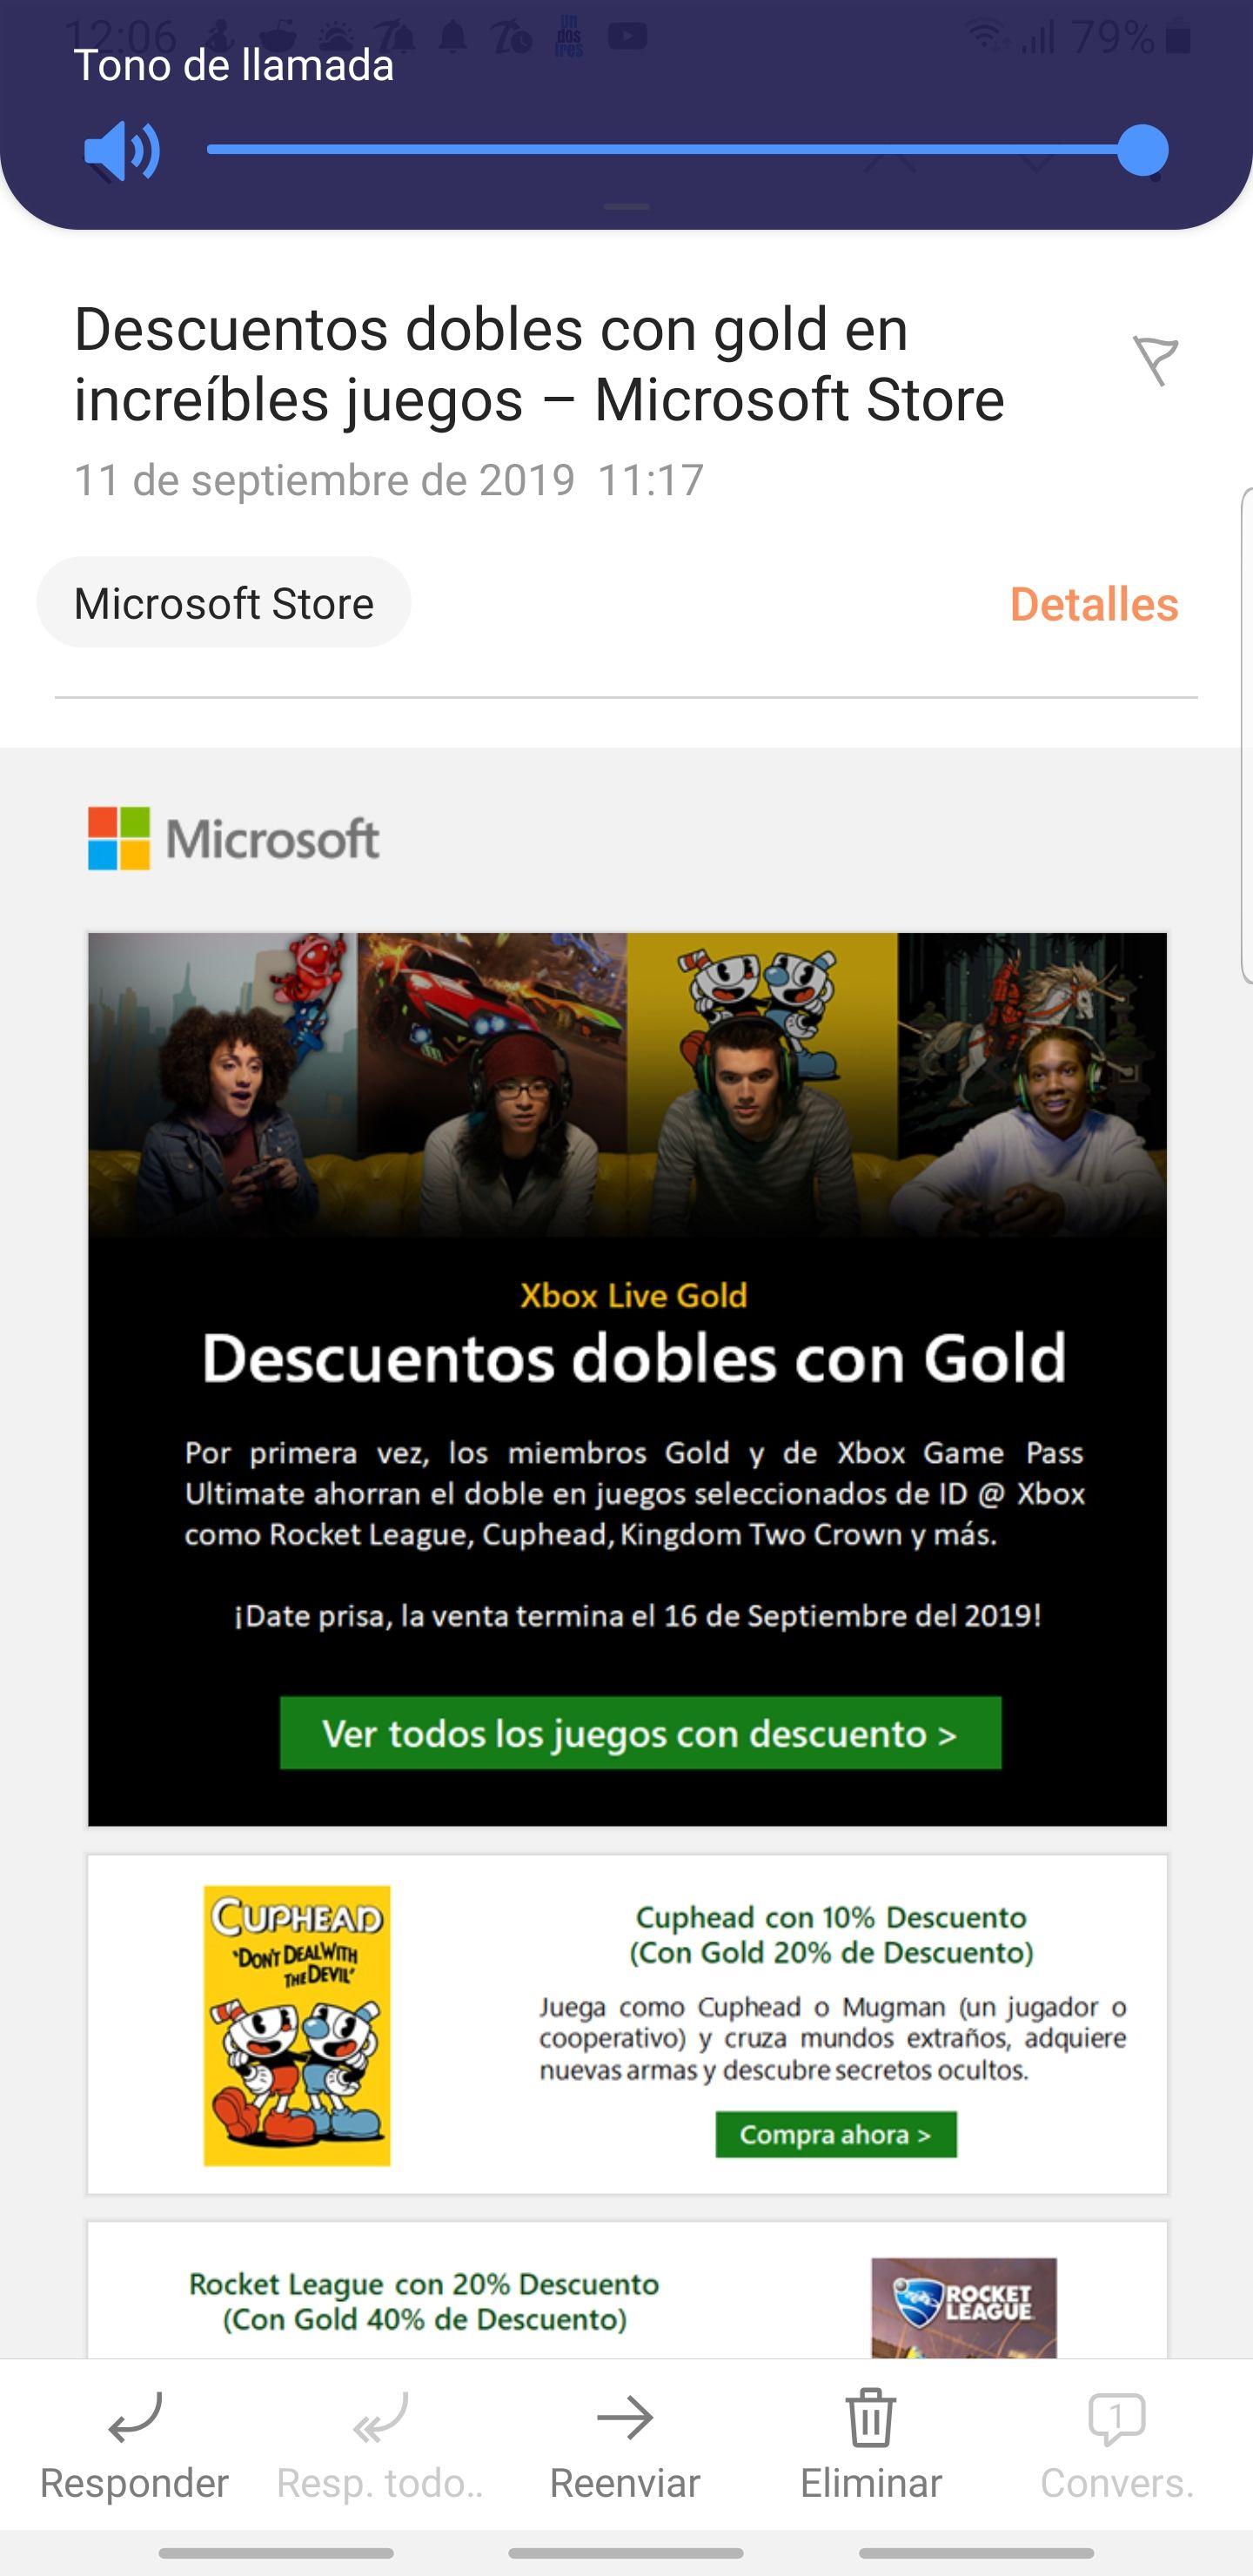 Microsoft XBOX juegos con descuento doble con gold